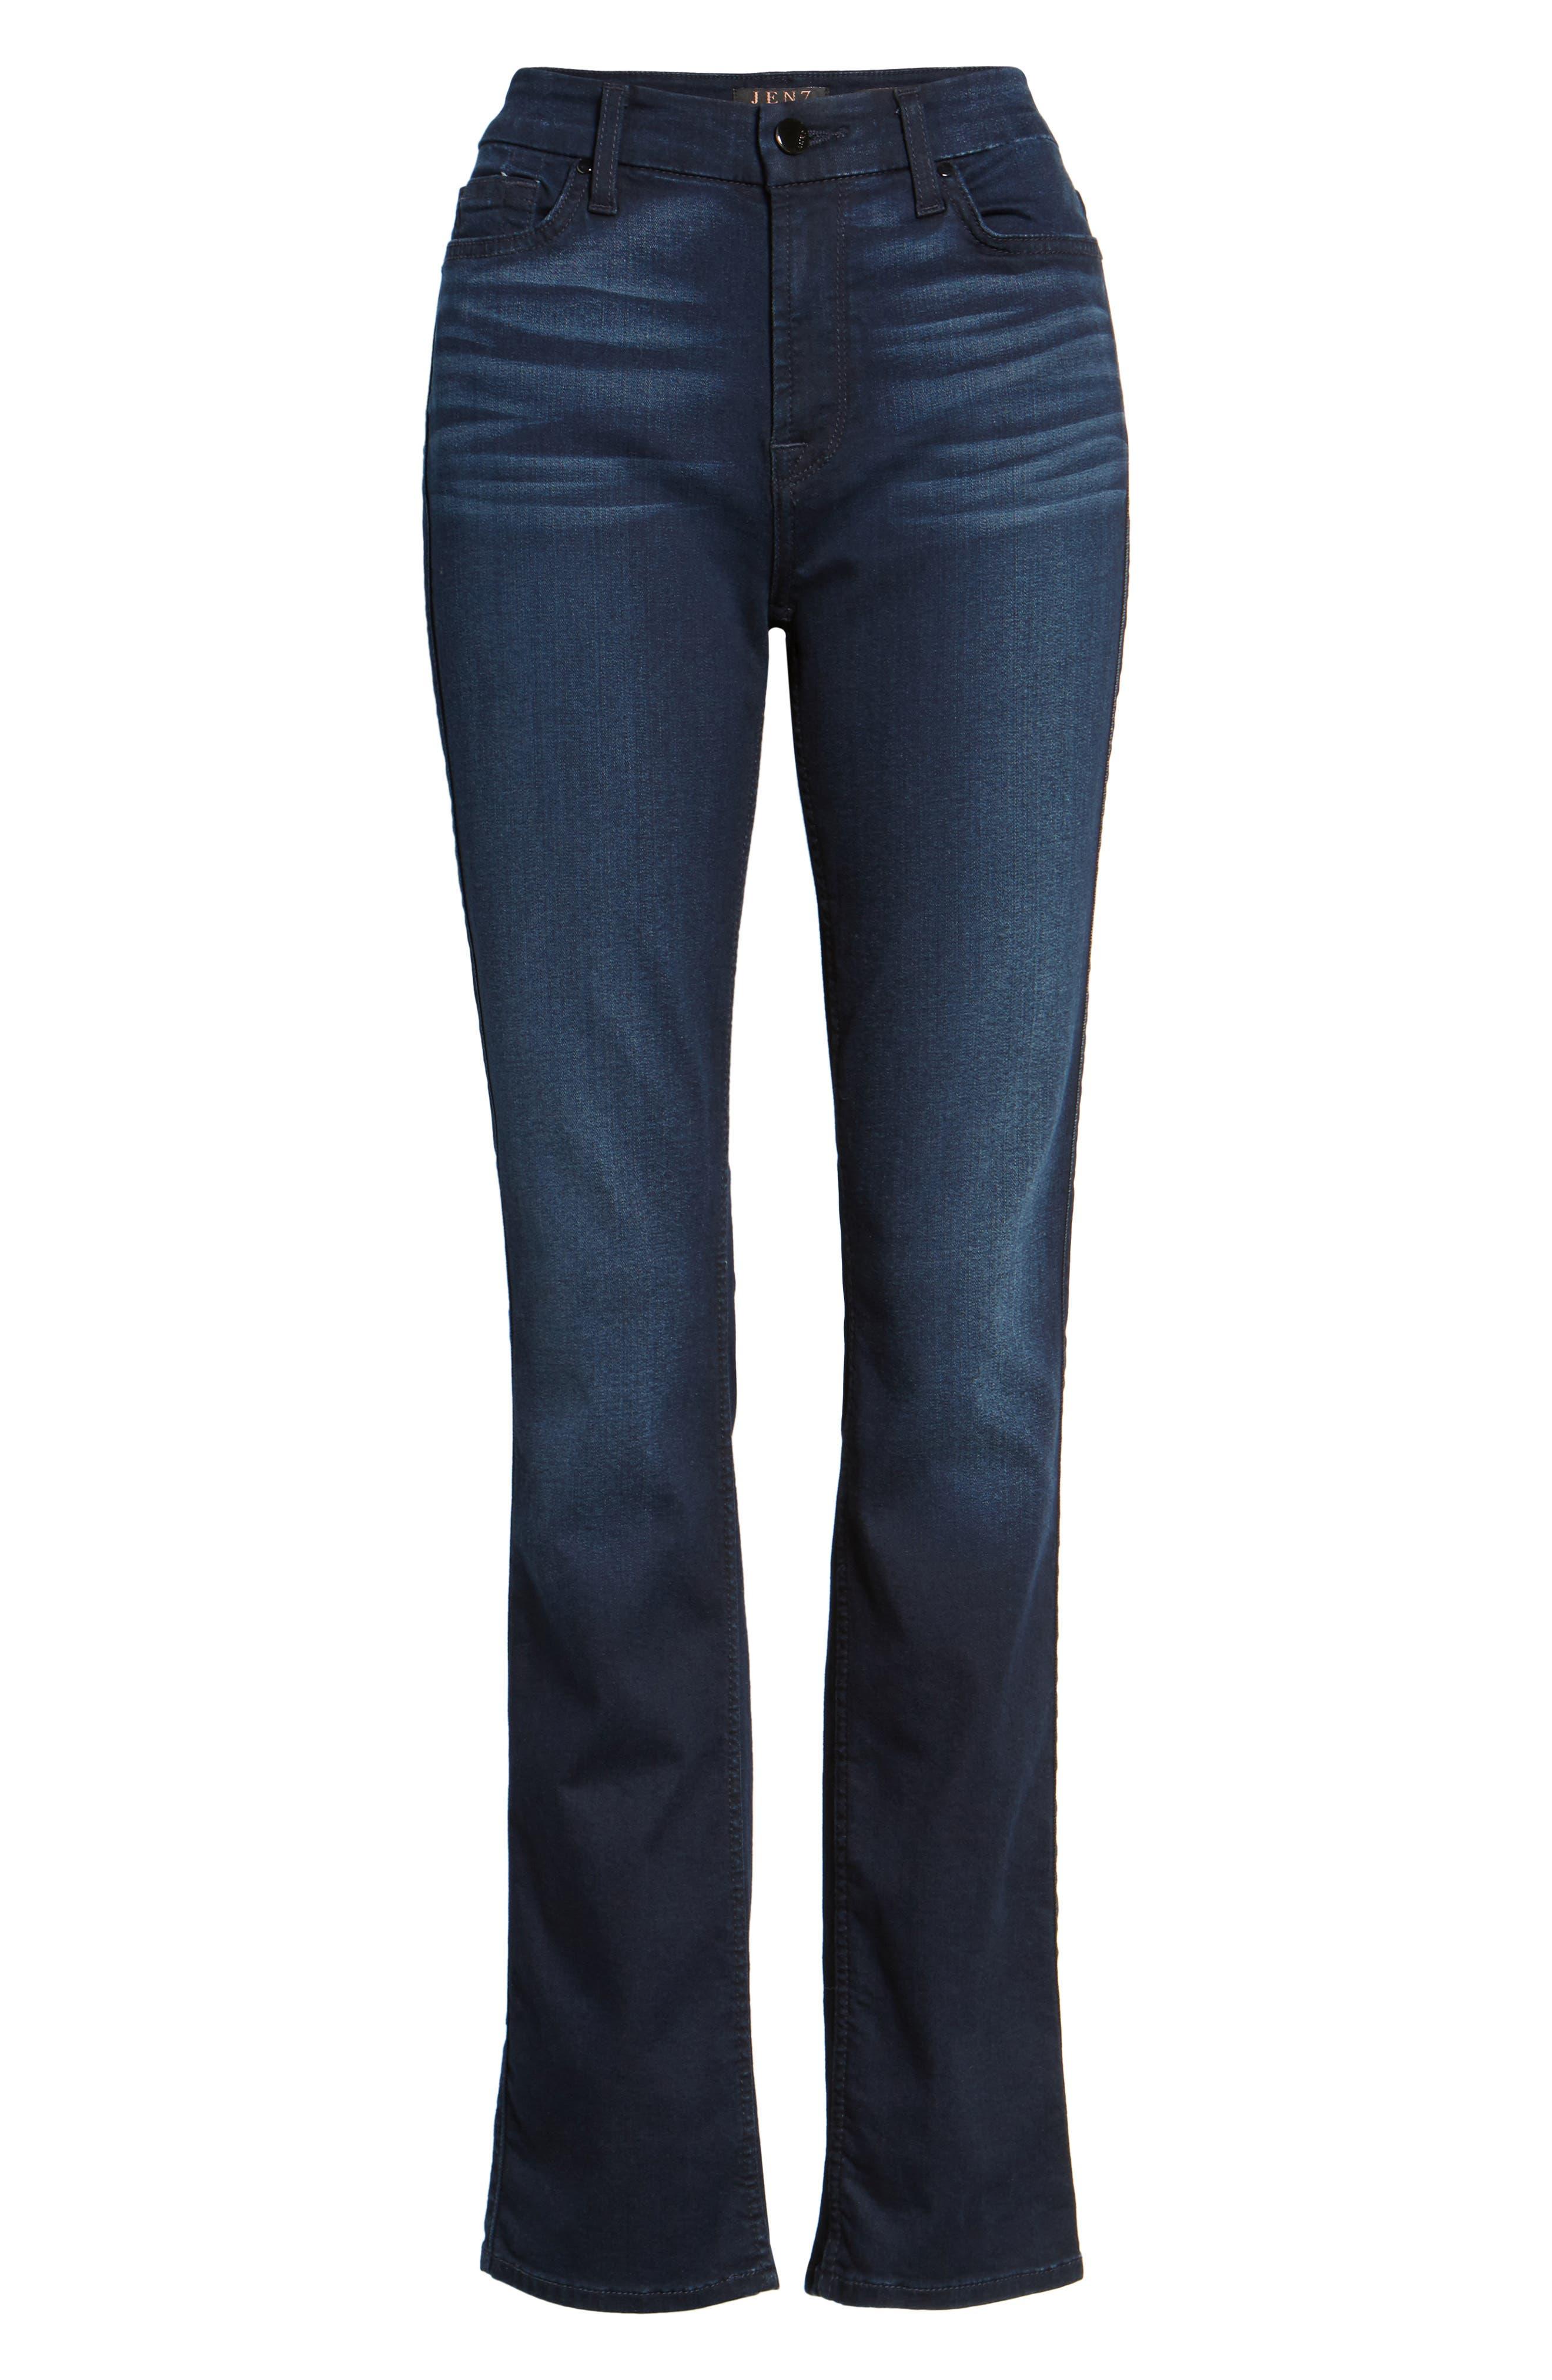 Slim Straight Jeans,                             Alternate thumbnail 6, color,                             Riche Touch Blue/ Black